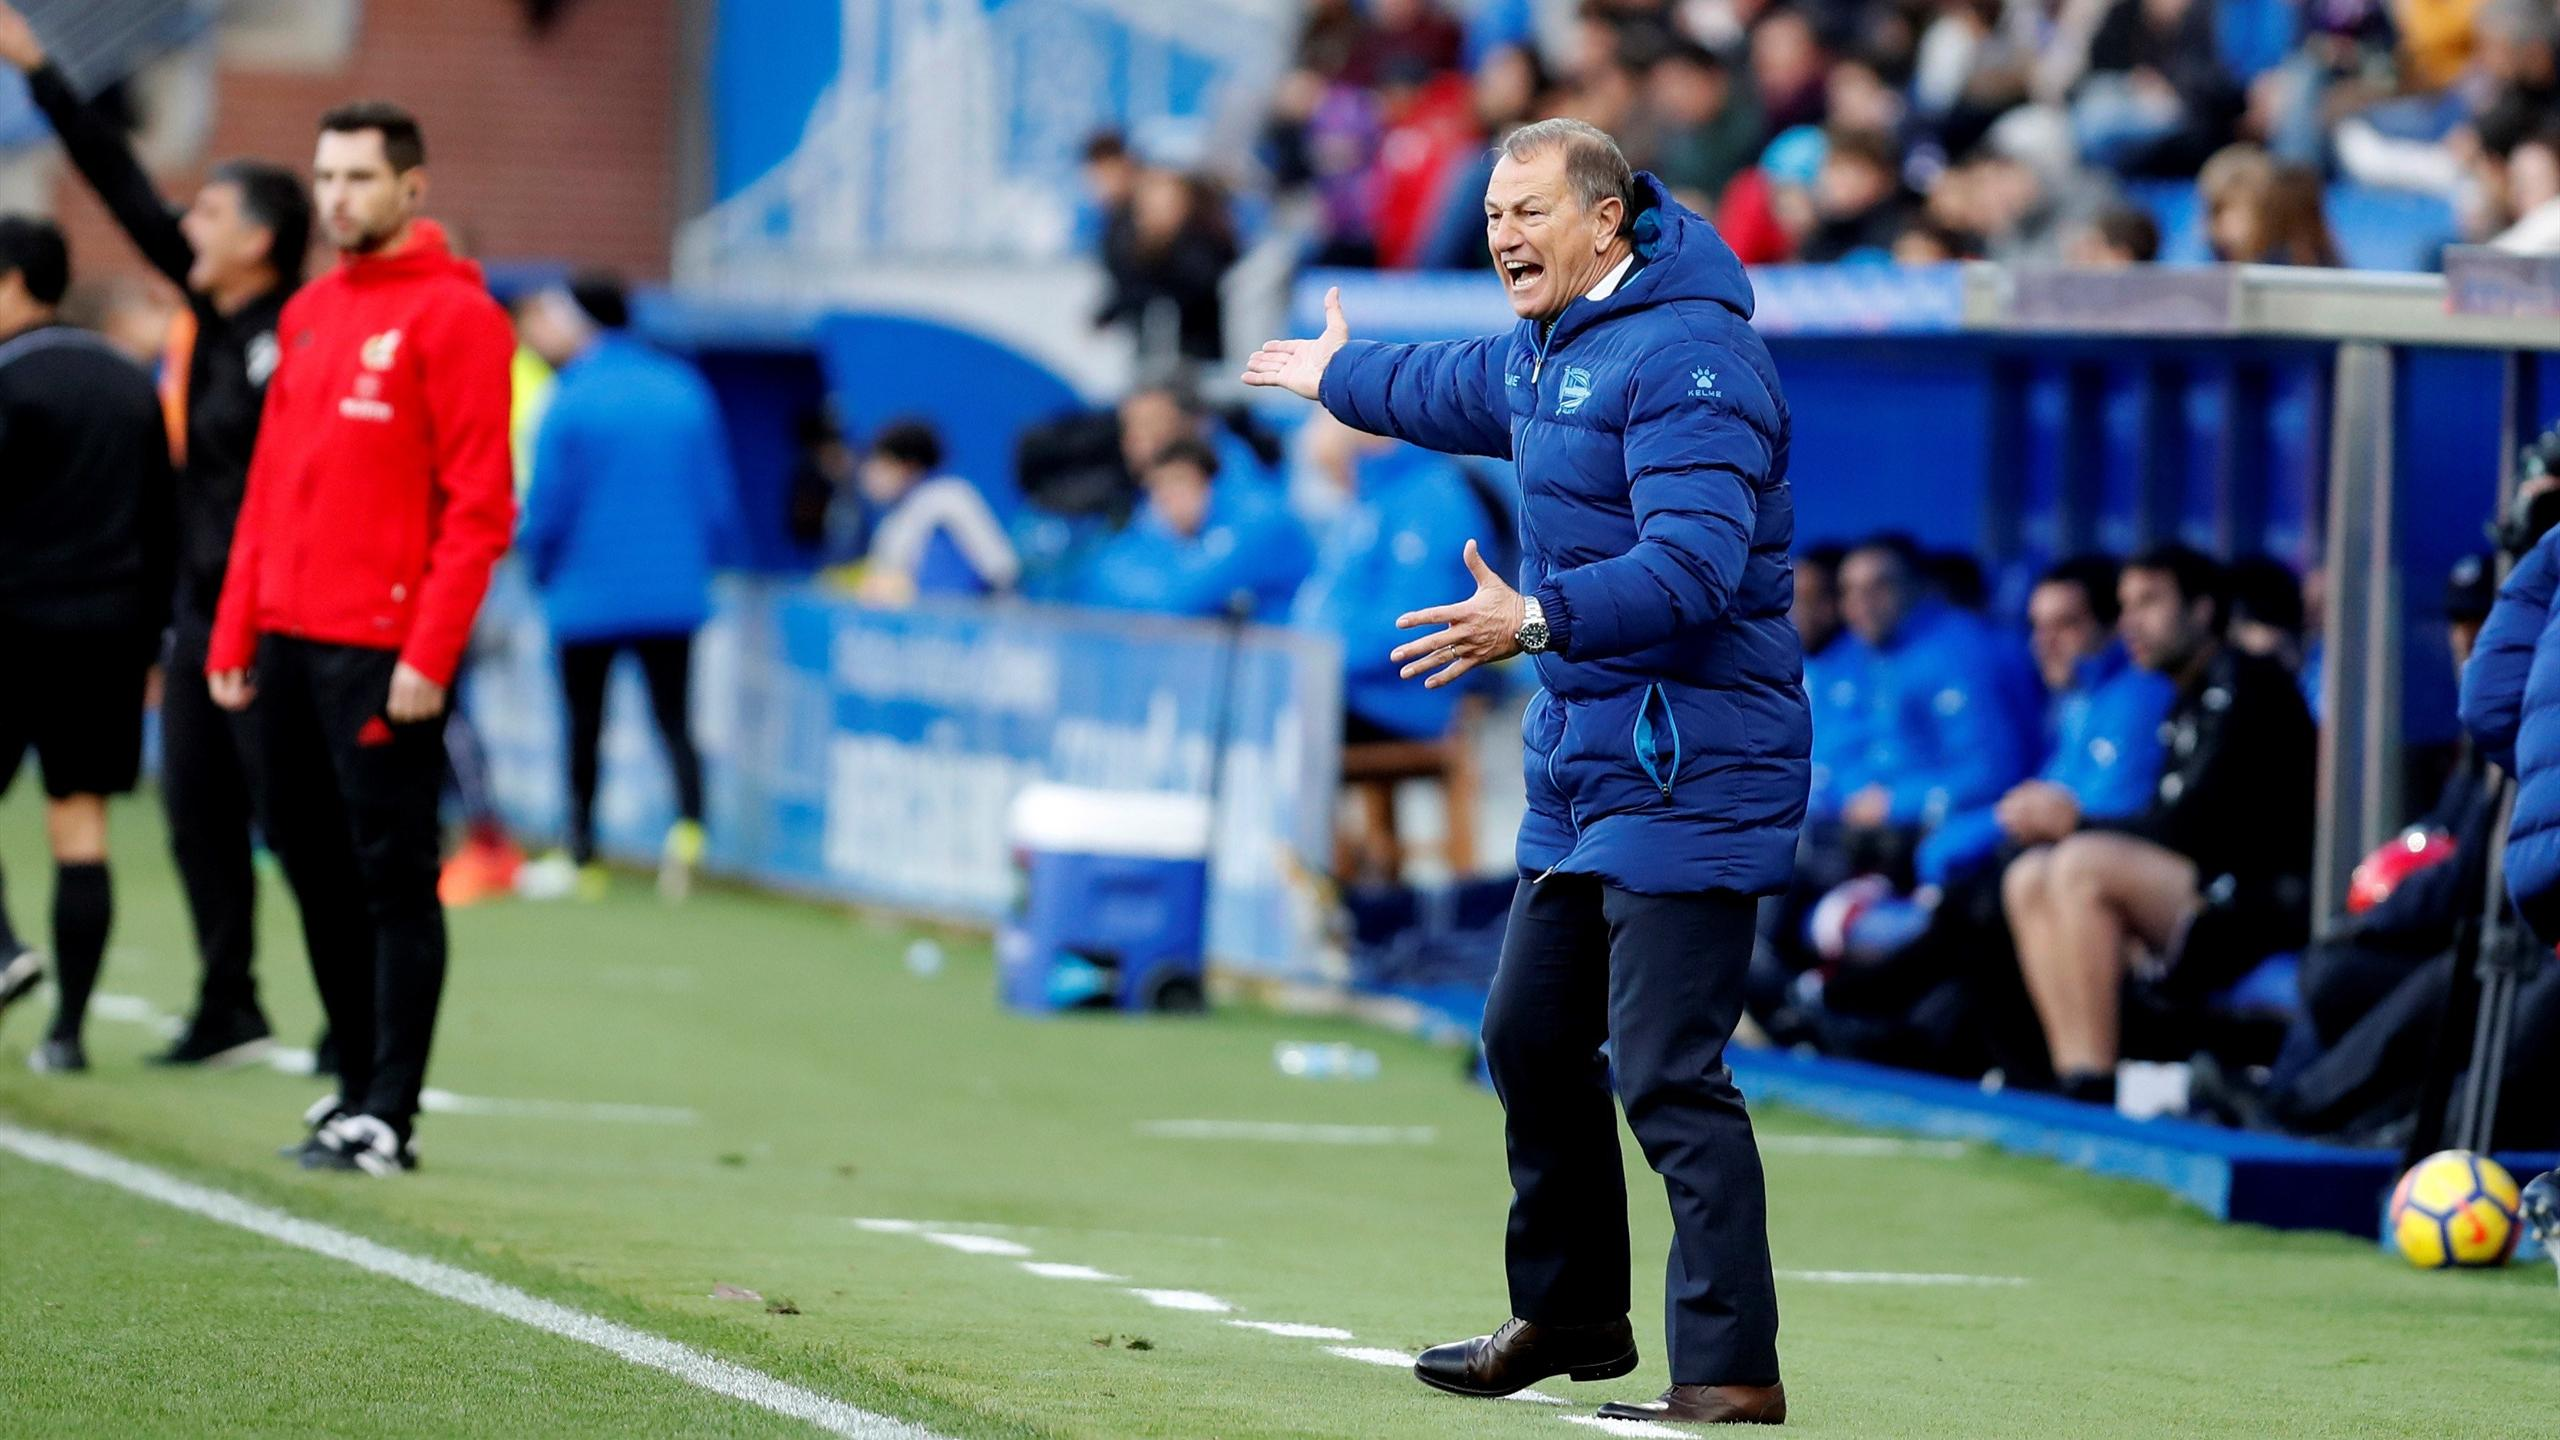 El Alavés destituye a Gianni De Biasi - Fútbol - Eurosport